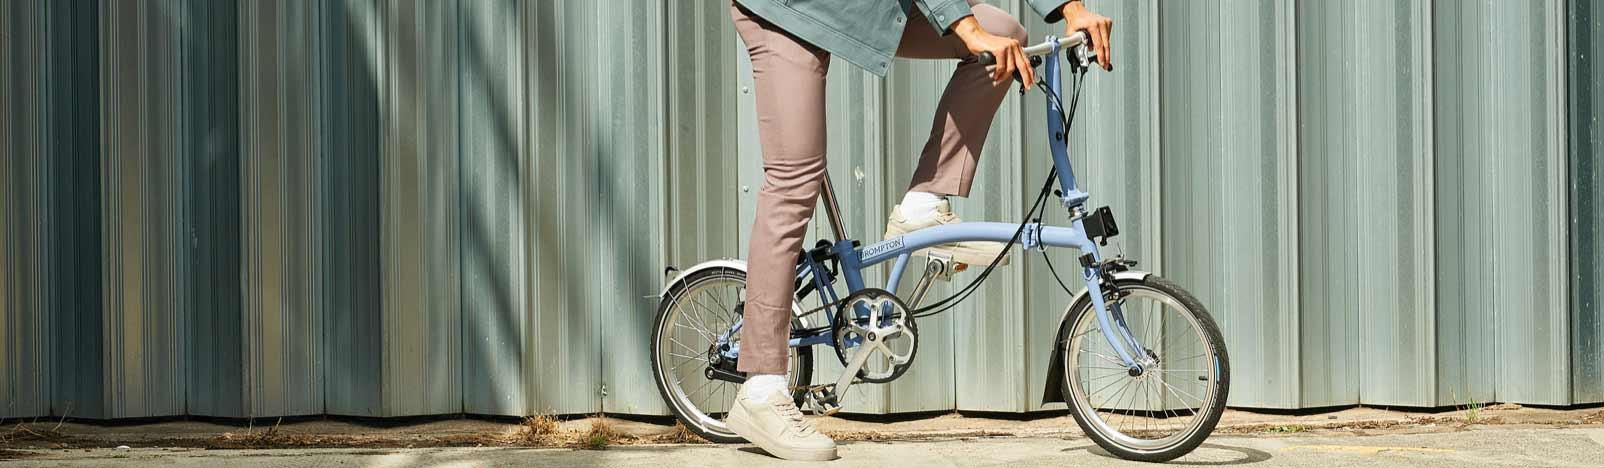 Brompton Bicycle Model Year 21, MY21